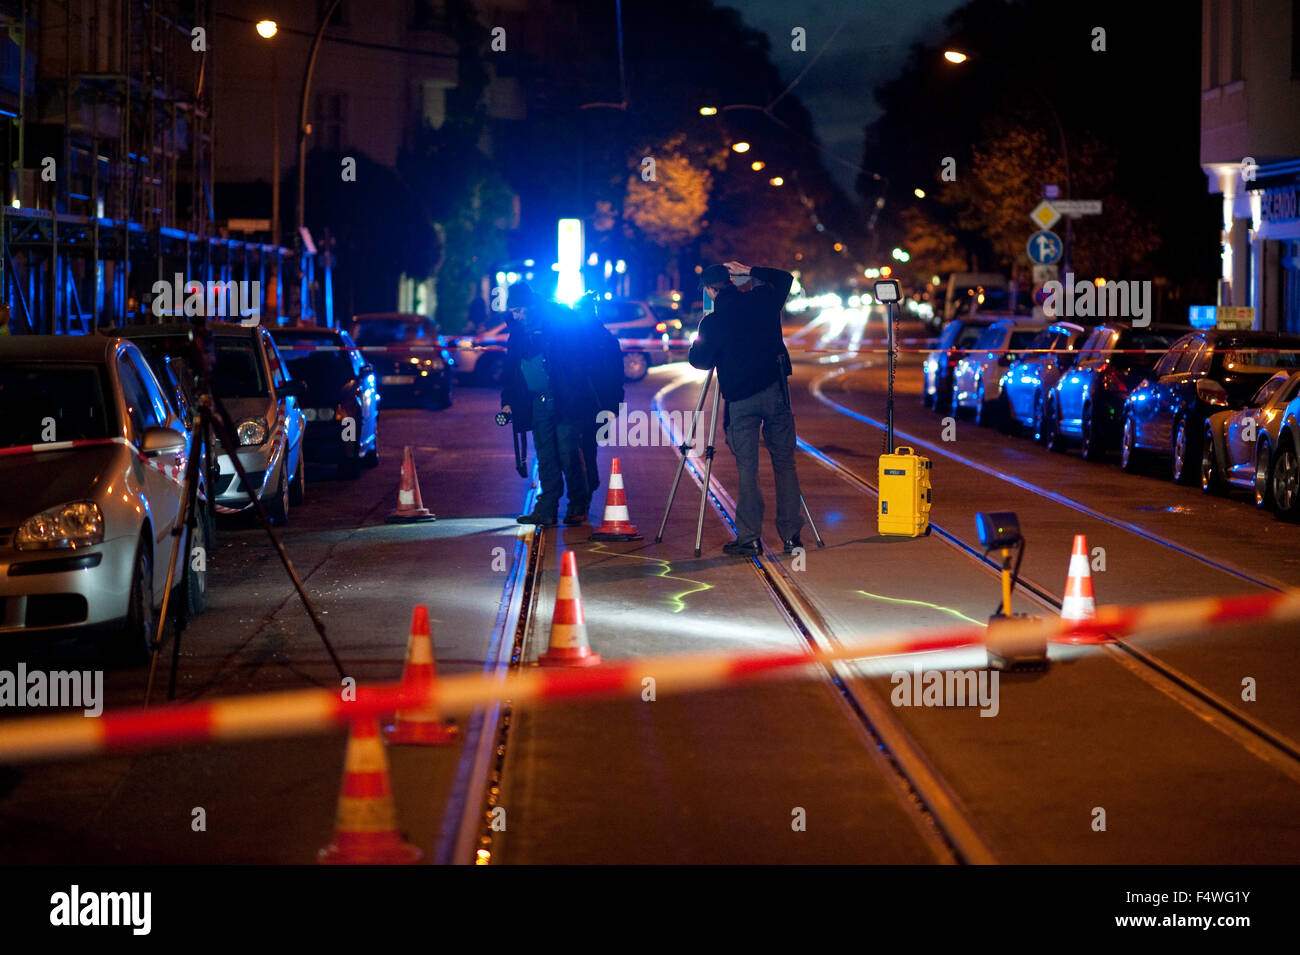 Officers of the Criminal Investigation Department examine a crime scene in Kopernikusstrasse in Berlin, 23 October - Stock Image